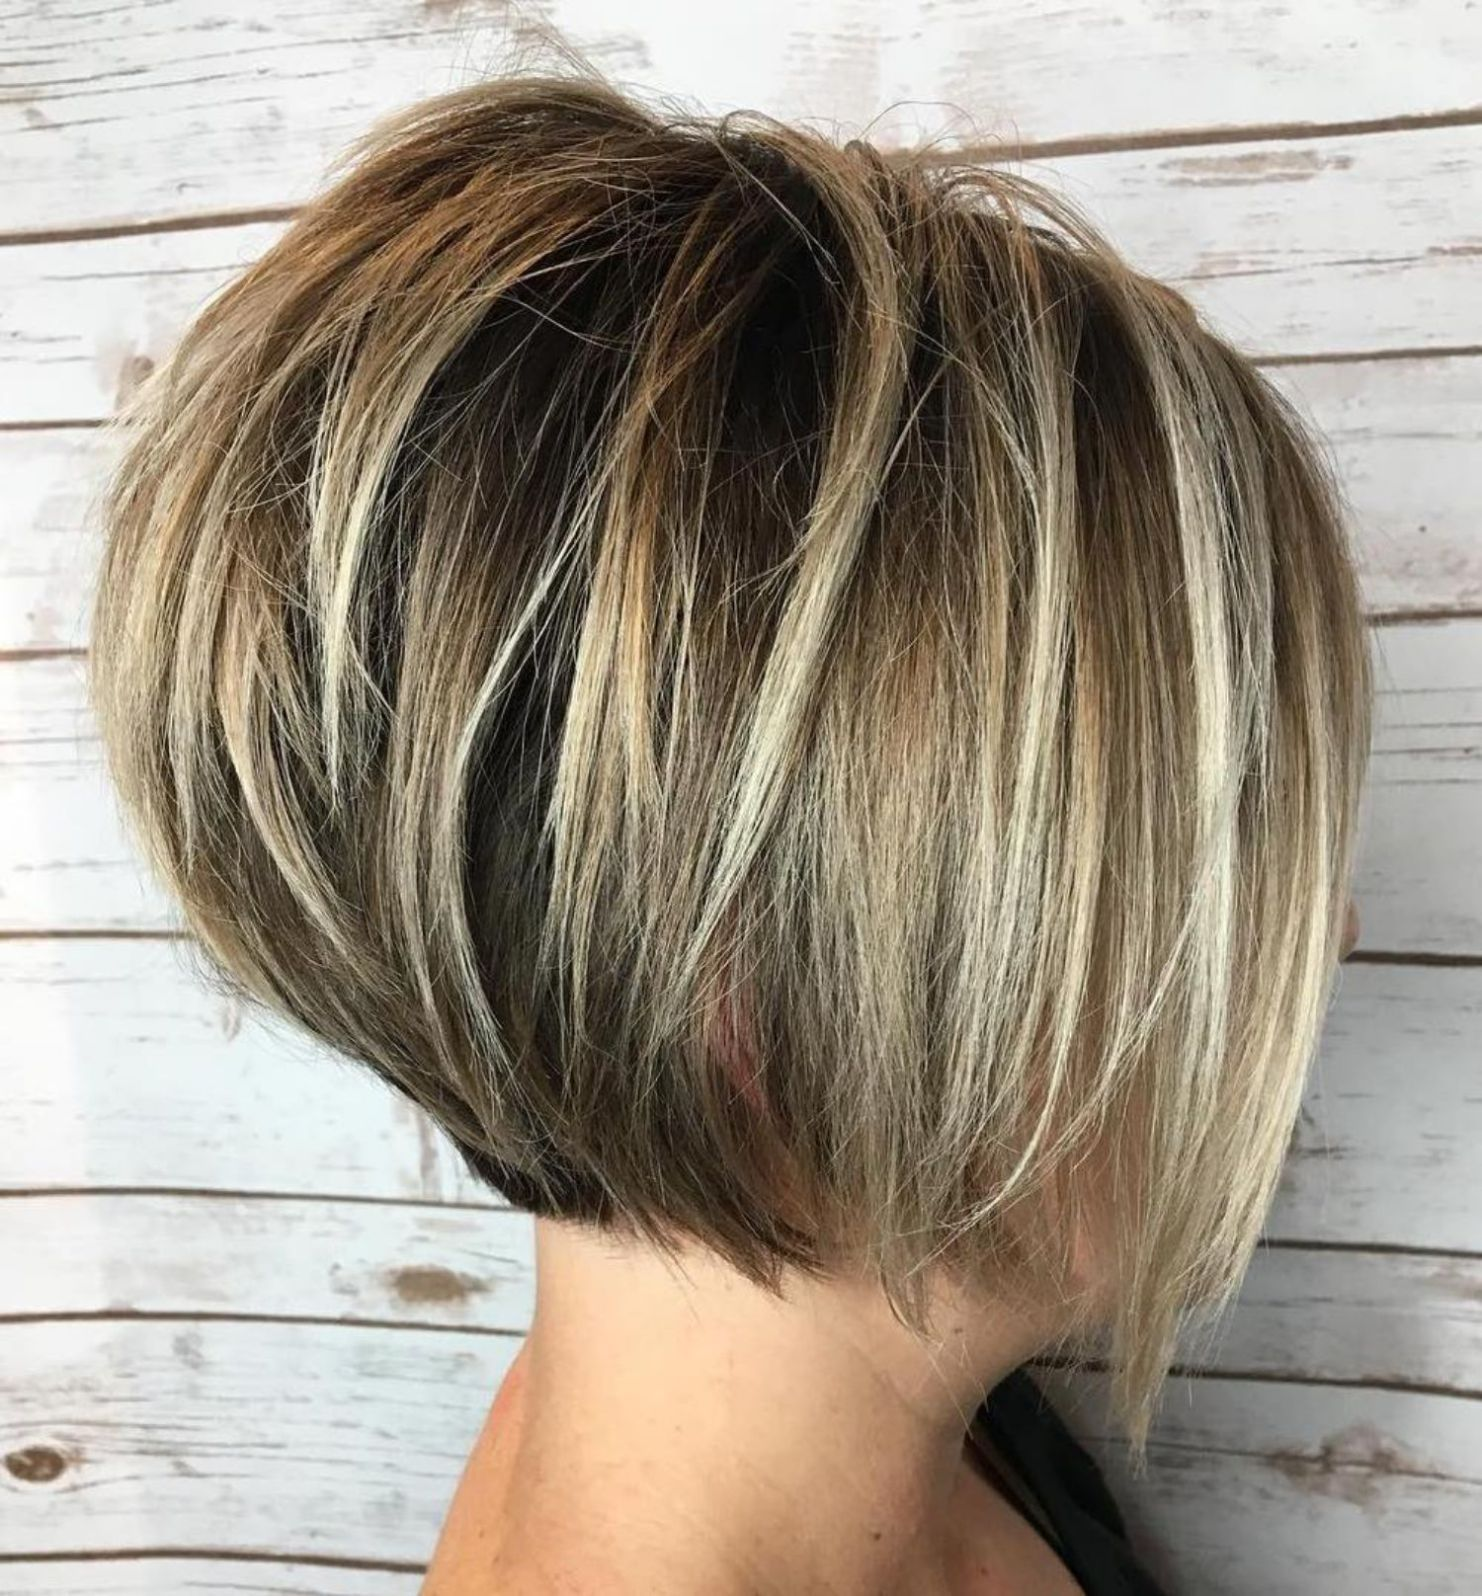 Pin On Hair Cut Great